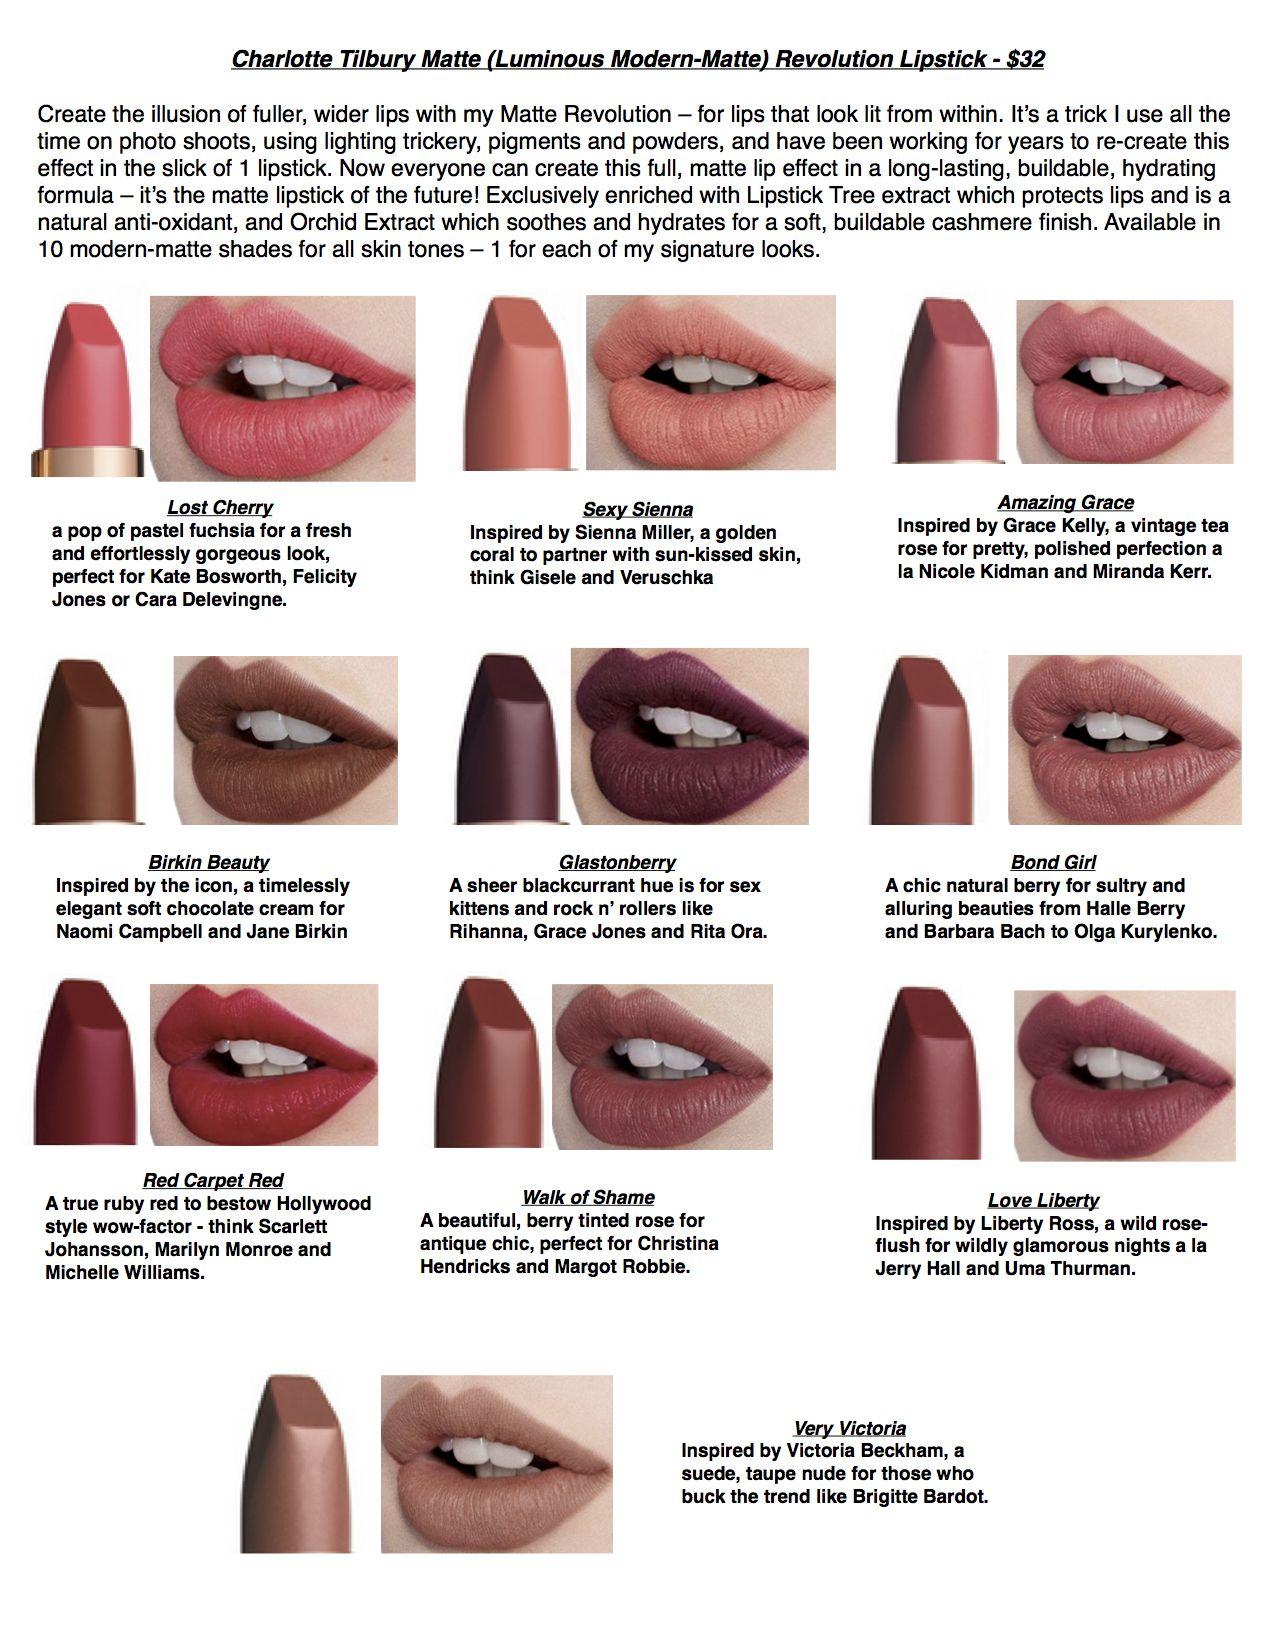 Charlotte Tilbury Matte Revolution Lipstick Swatches